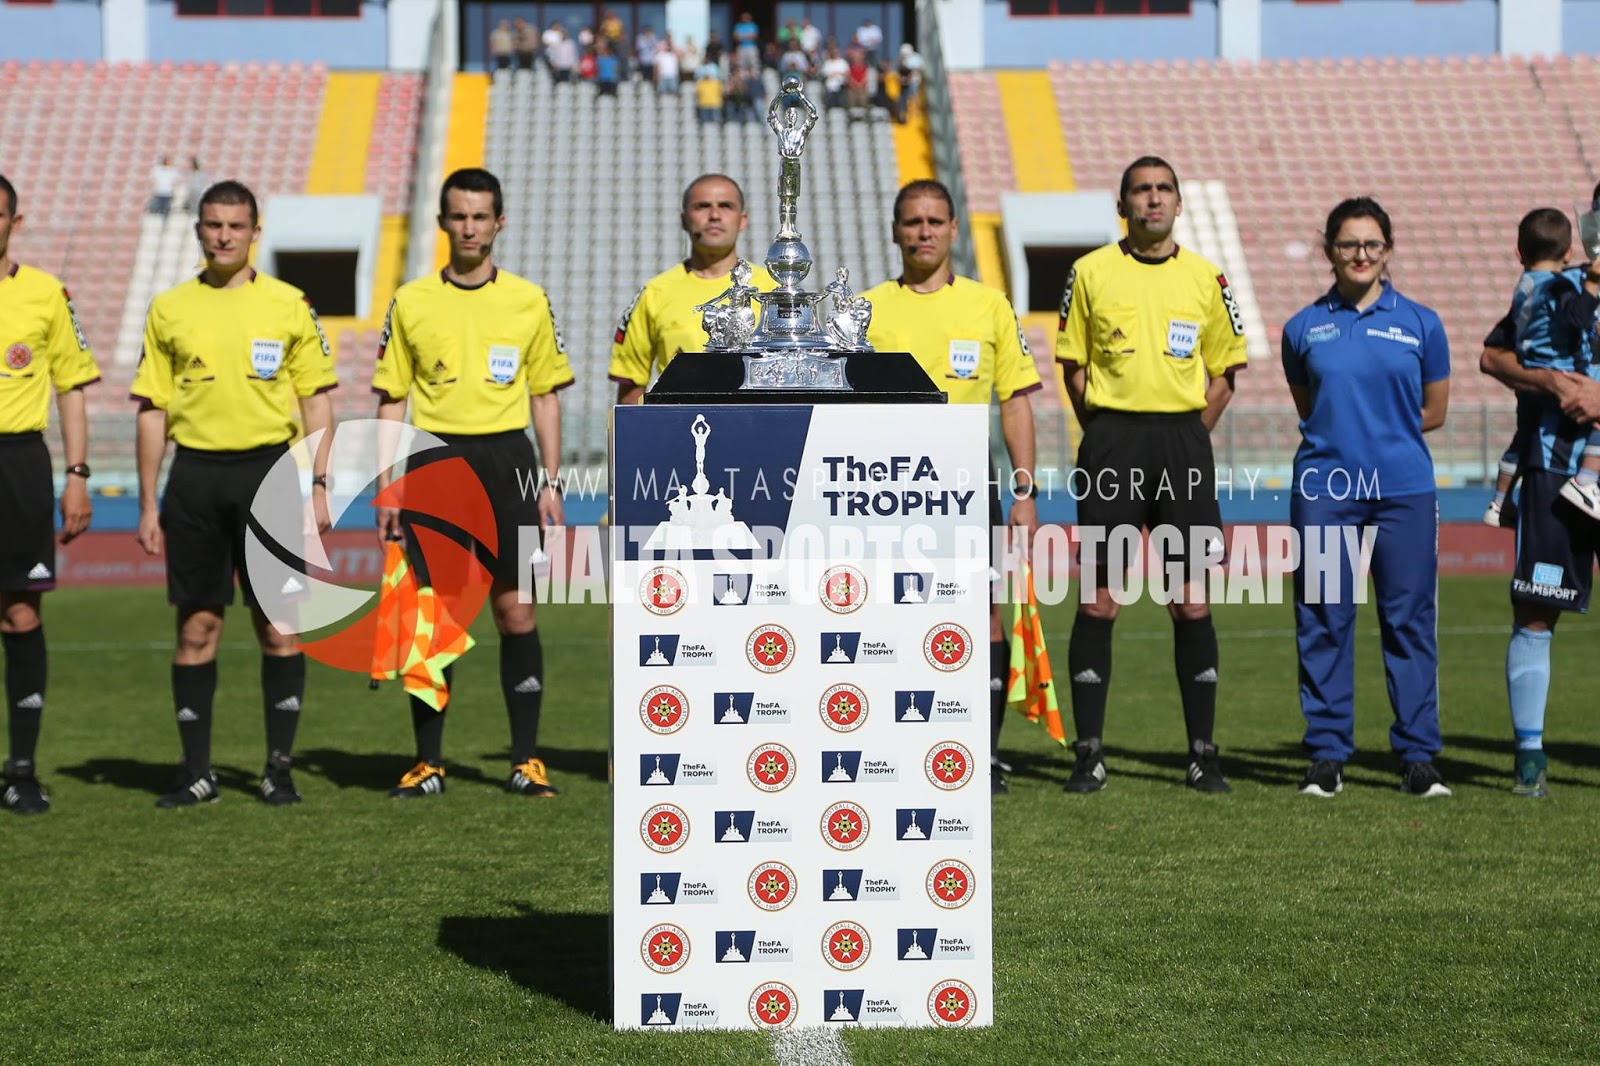 Malta fa trophy betting trends ufc 168 betting